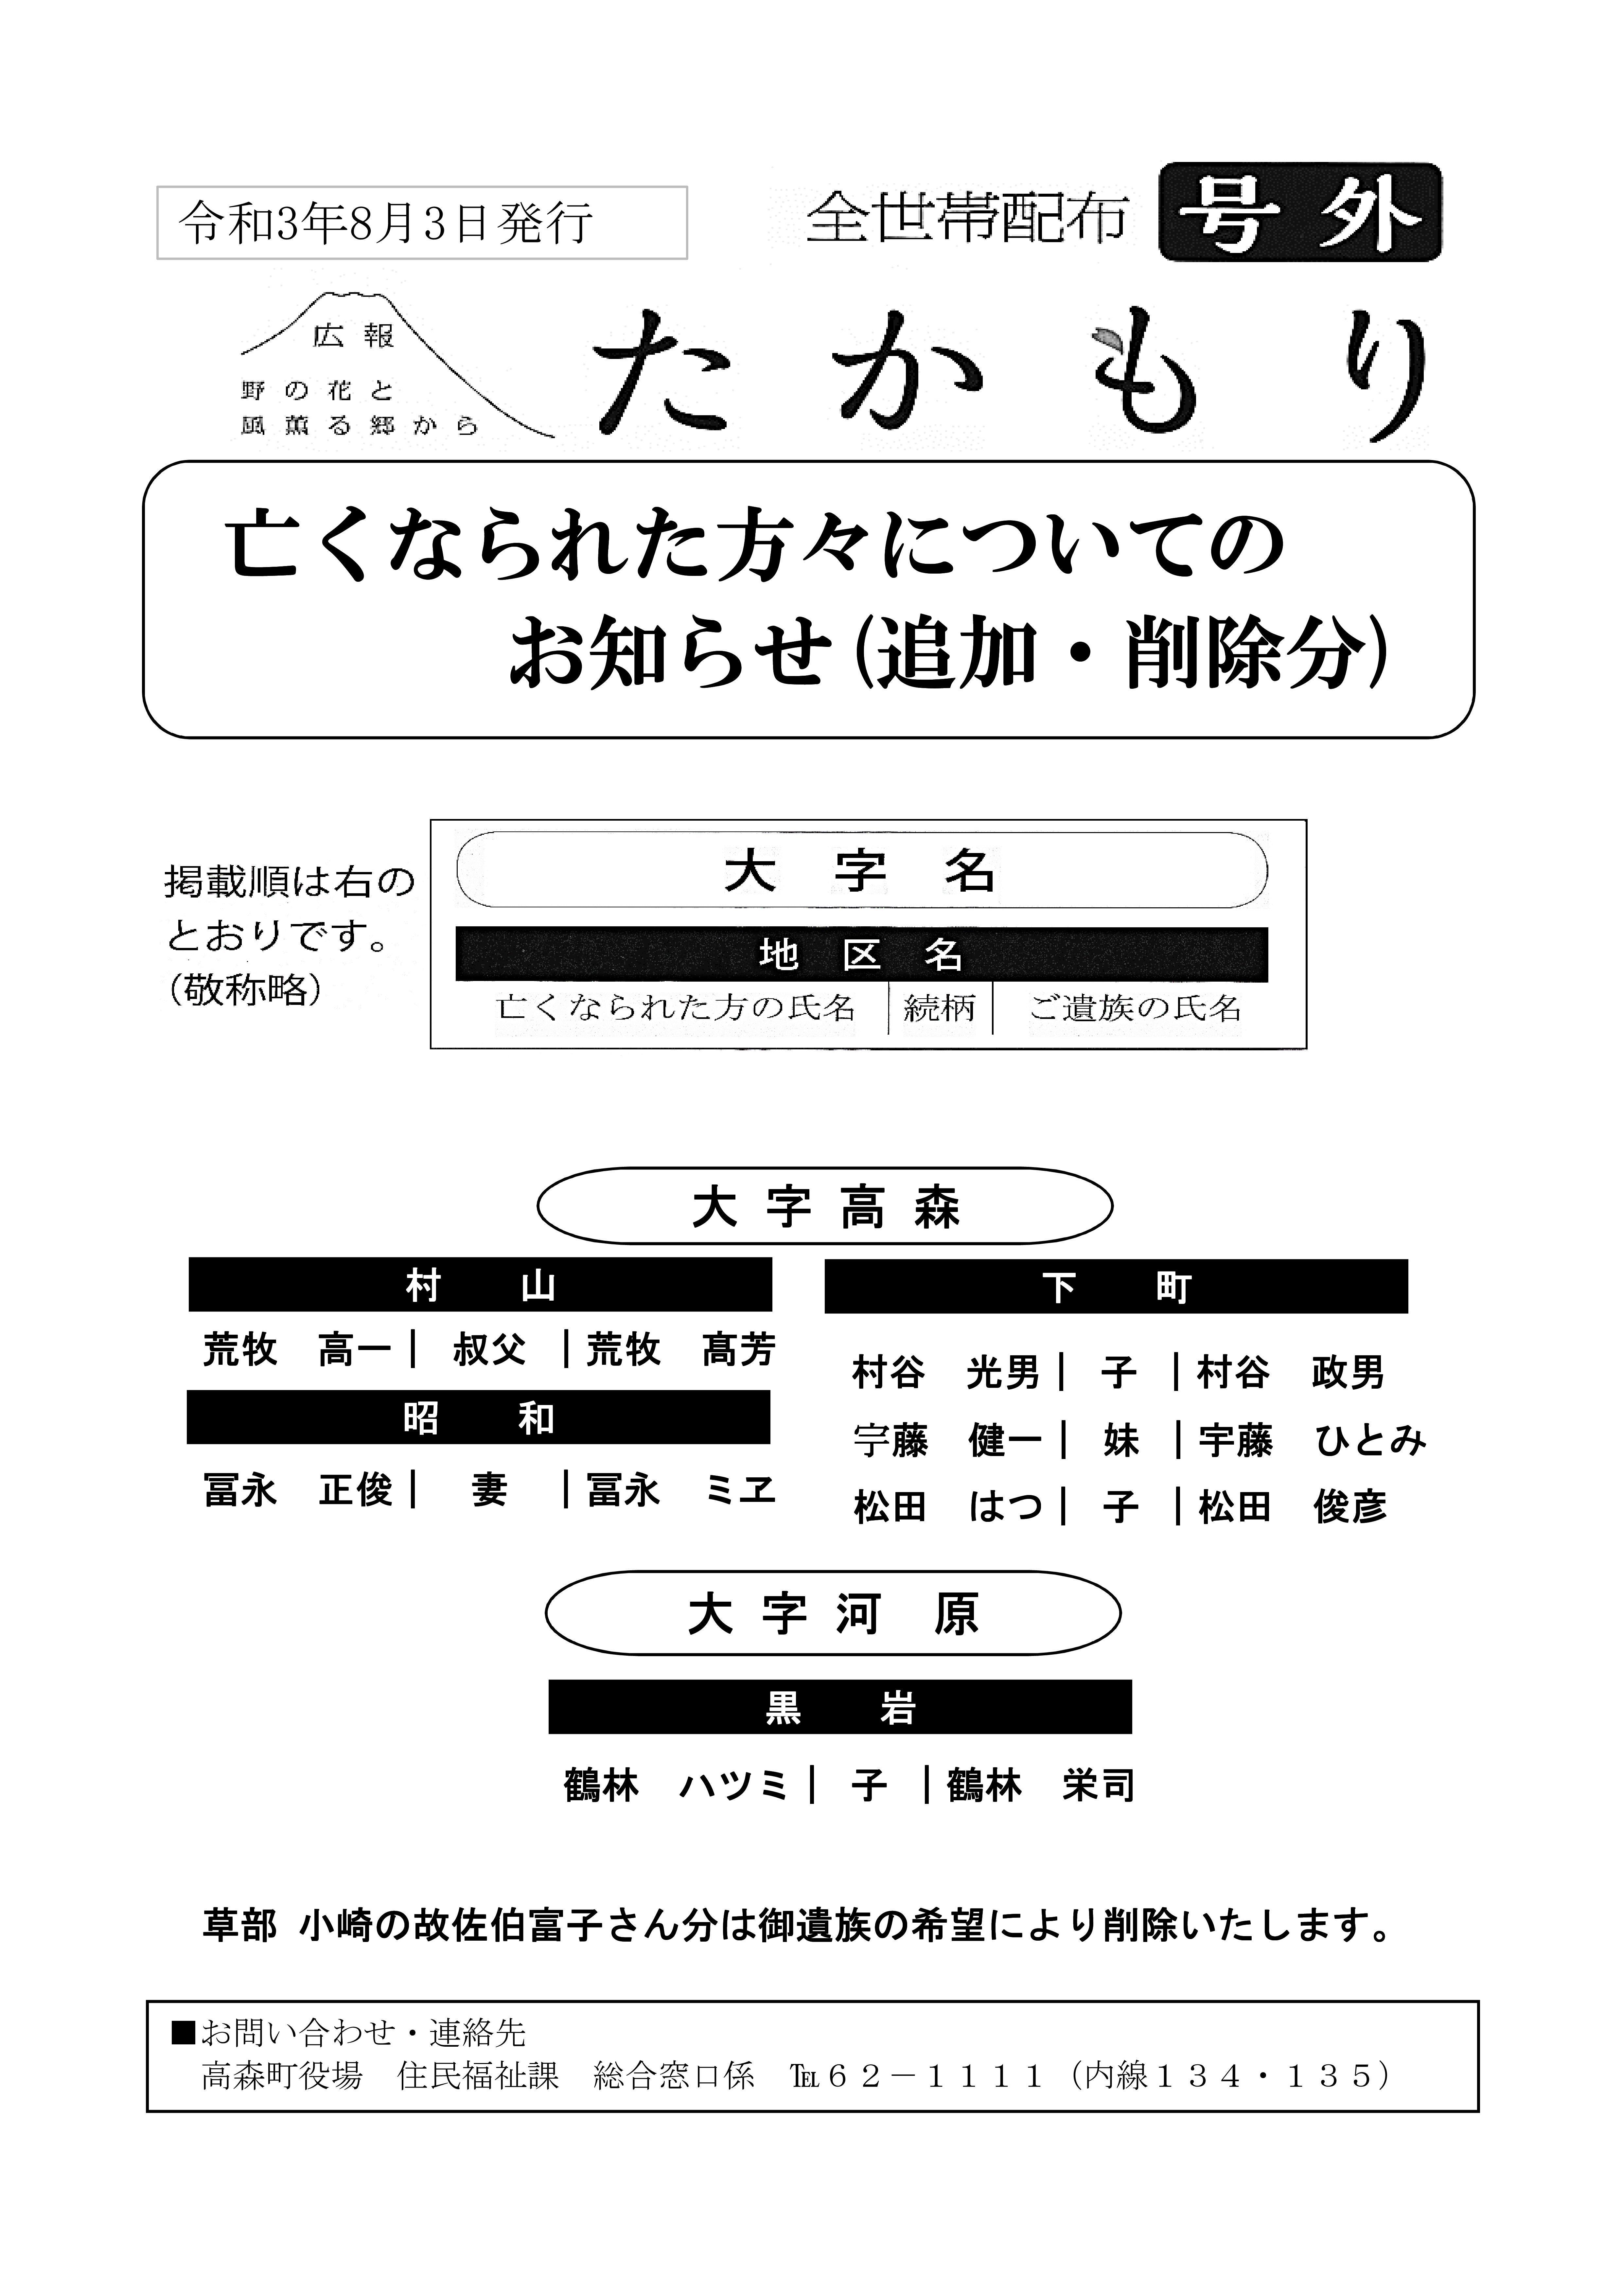 http://www.town.takamori.kumamoto.jp/chosha/somu/upload/8b075a3b6fbfd3cd5a5171bf072a1b0c8cb9a076.jpg